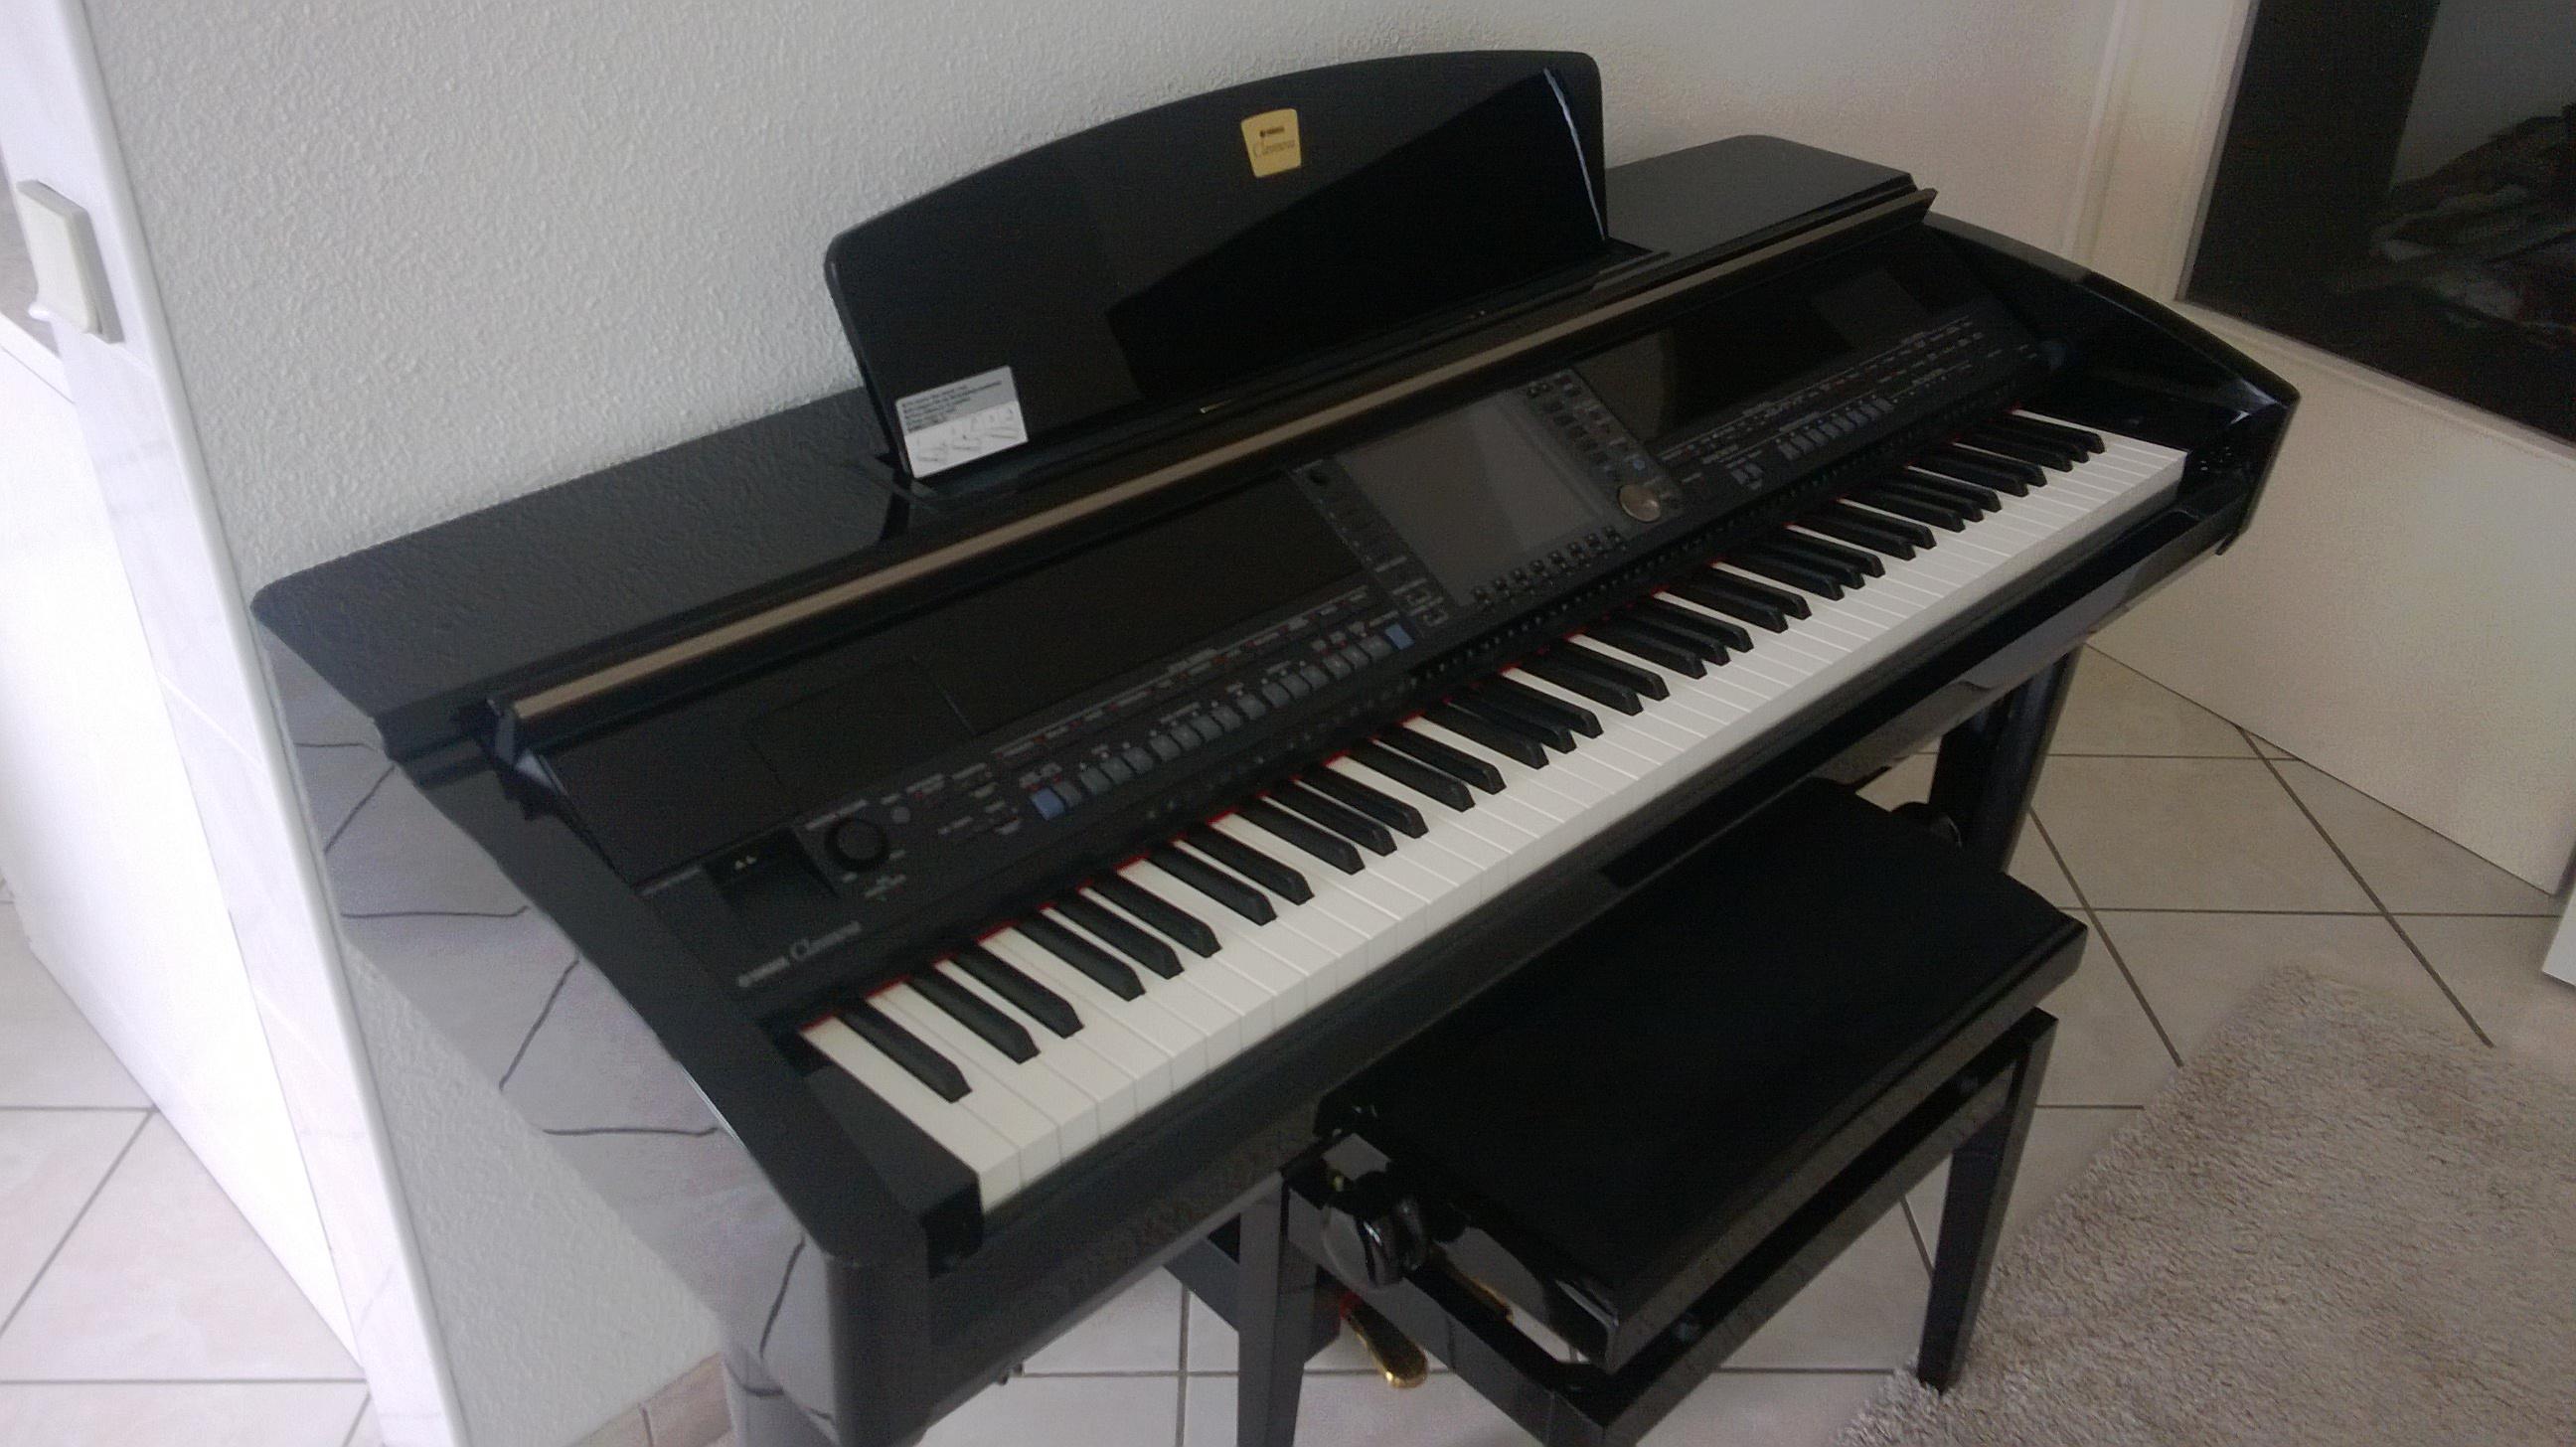 Yamaha cvp 409 image 961229 audiofanzine for Yamaha clavinova cvp 409